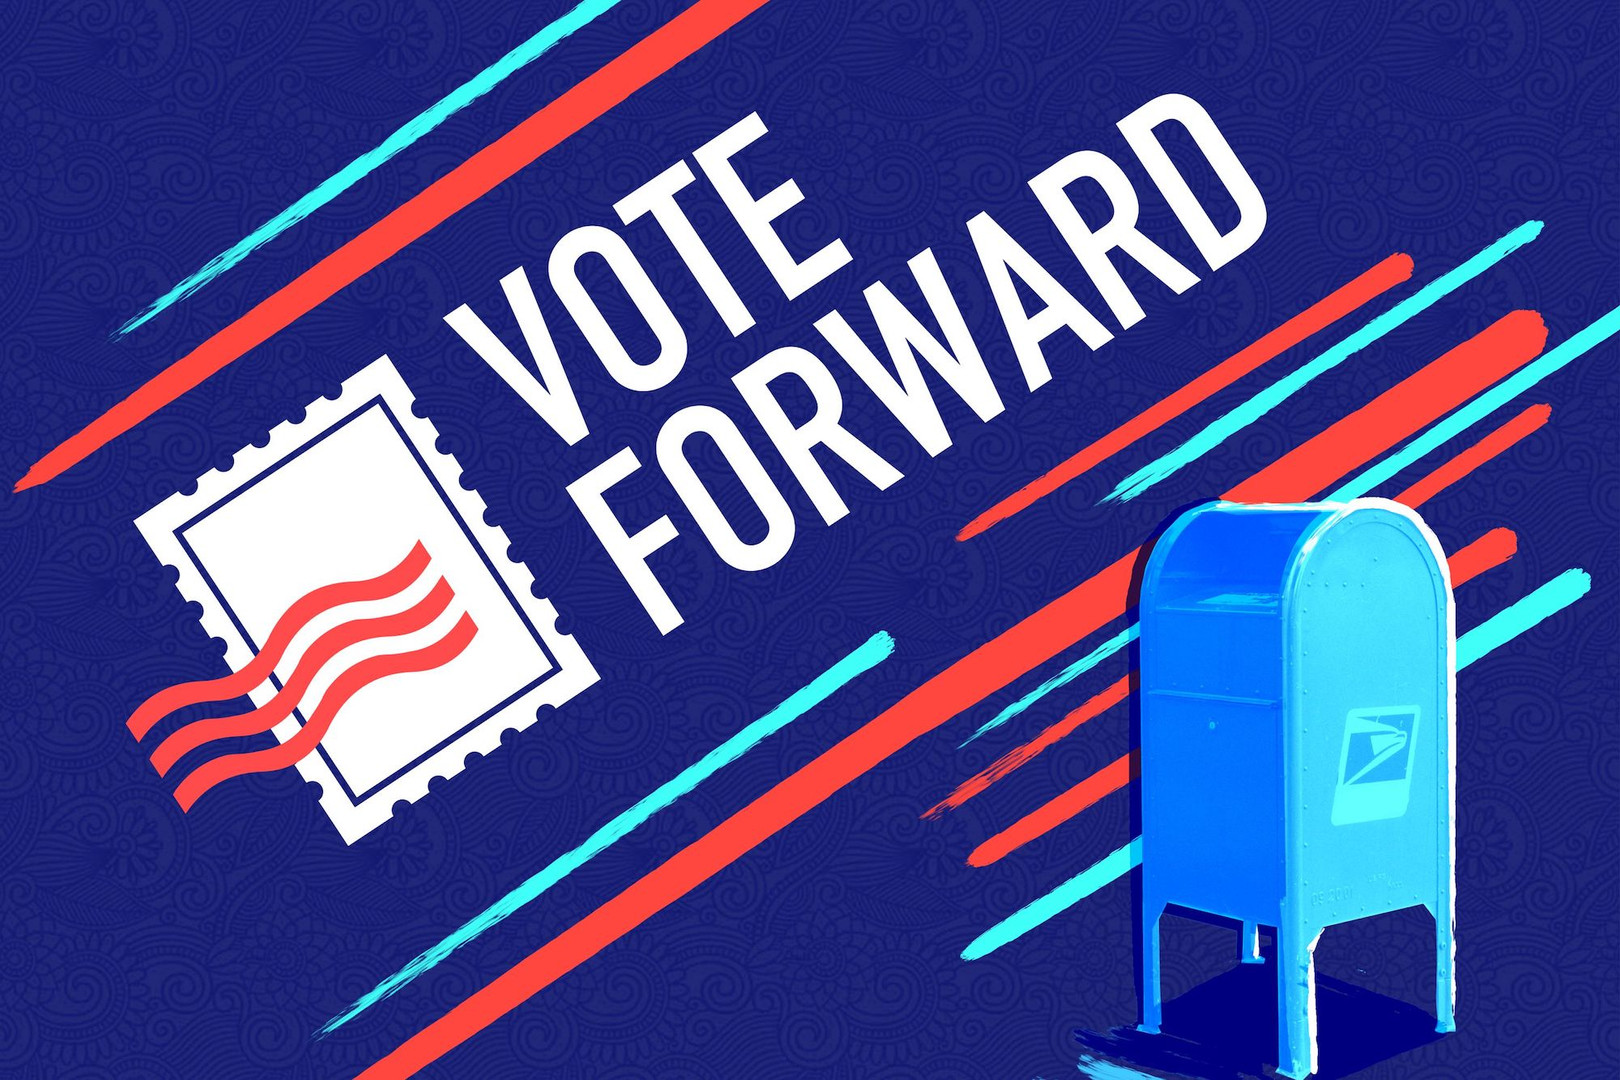 Vote Forward